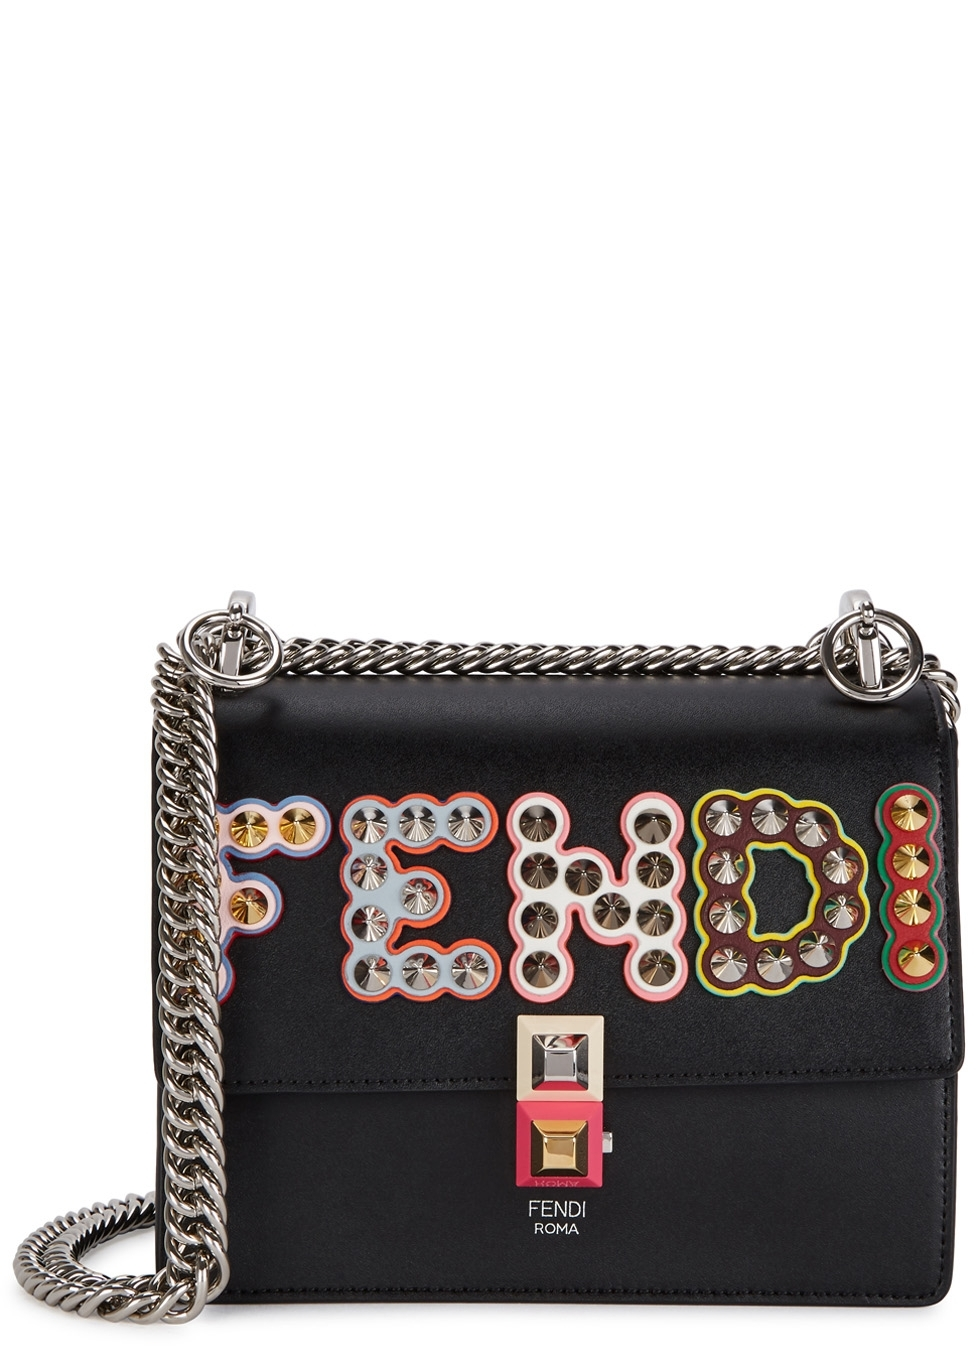 Designer Bags Purses Gifts For Her Harvey Nichols Gucci Alma Mini Bag